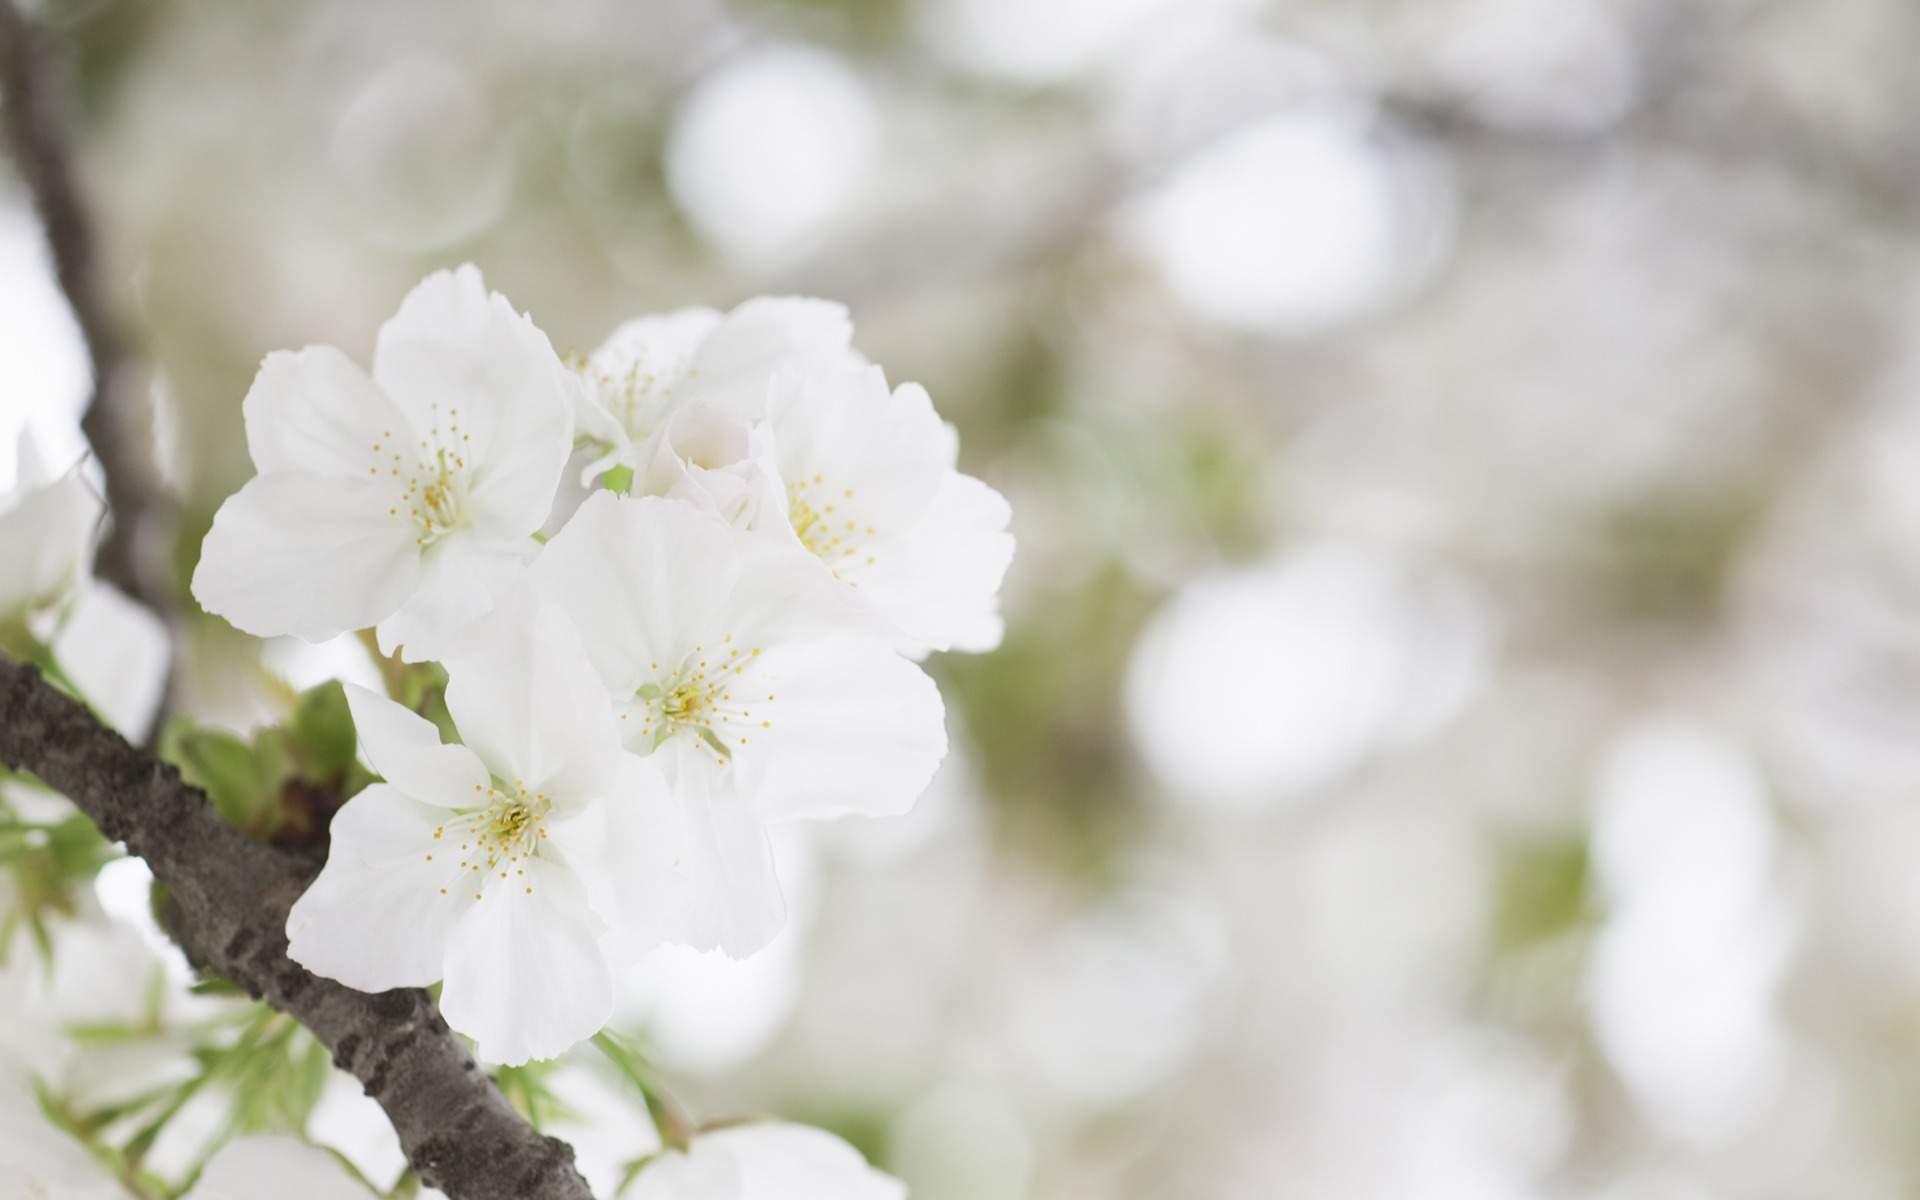 Free Photo Blooming White Flowers White Nature Fresh Free